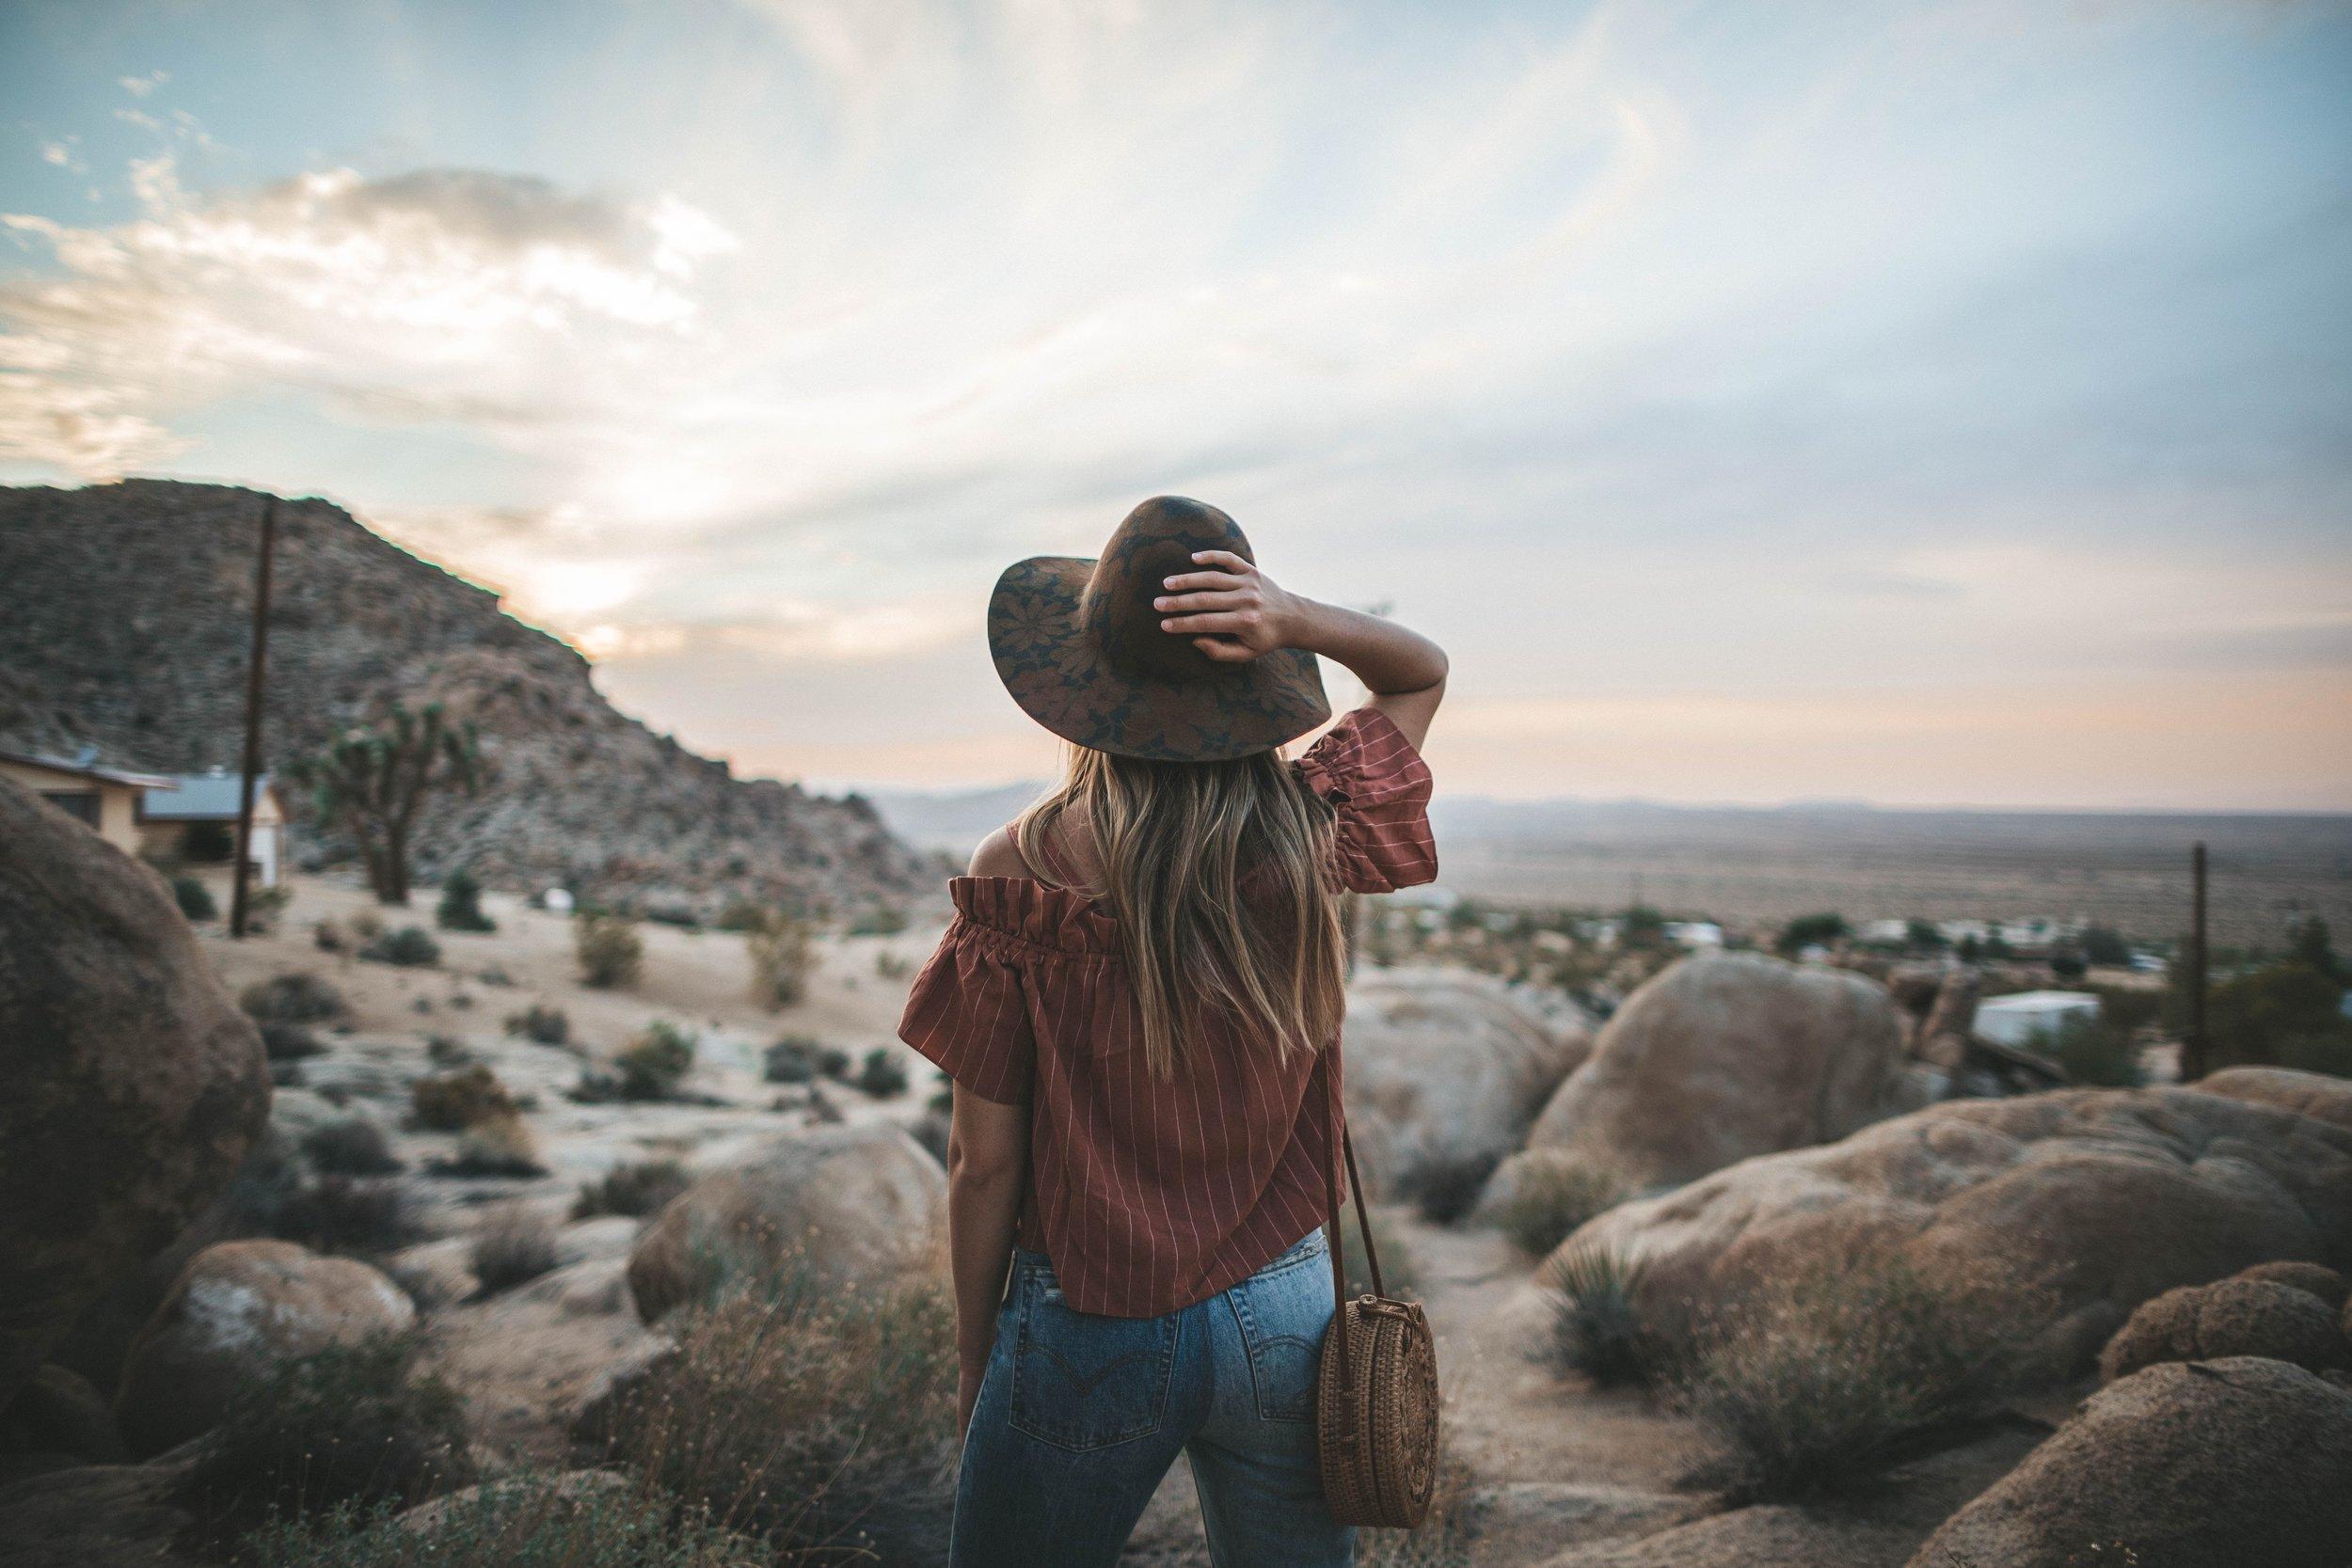 EXAMPLE: - #sunset #desert #denim #sunhat #denimlook #levis #urbandoutfitters #nordstrom #offtheshoulder #arizona #bucketbag #blondehair